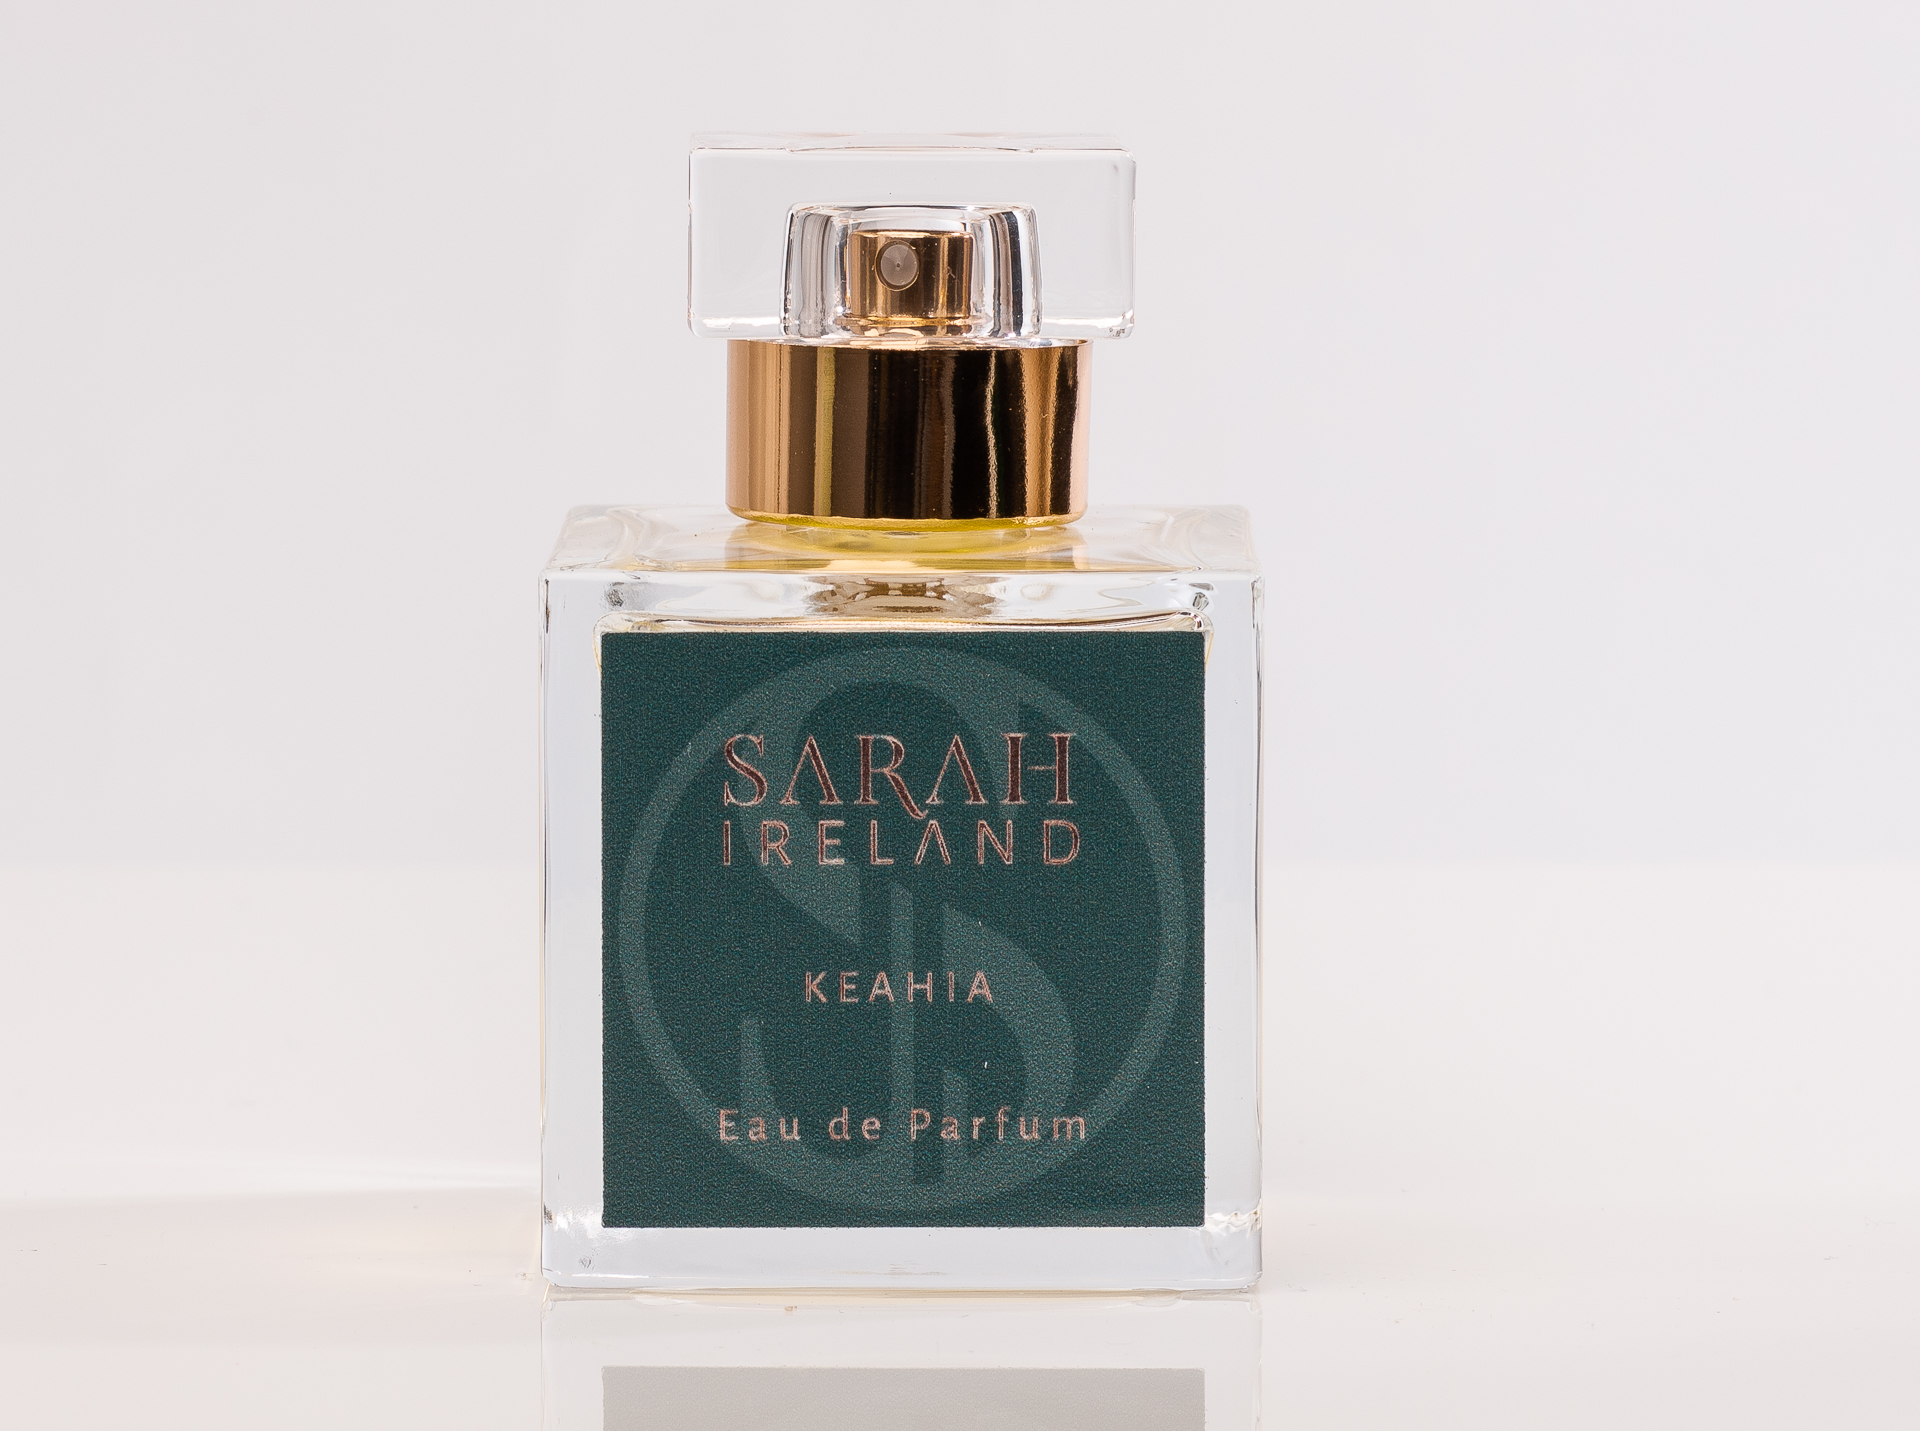 Sarah_Ireland_Product-Keahia-perfume